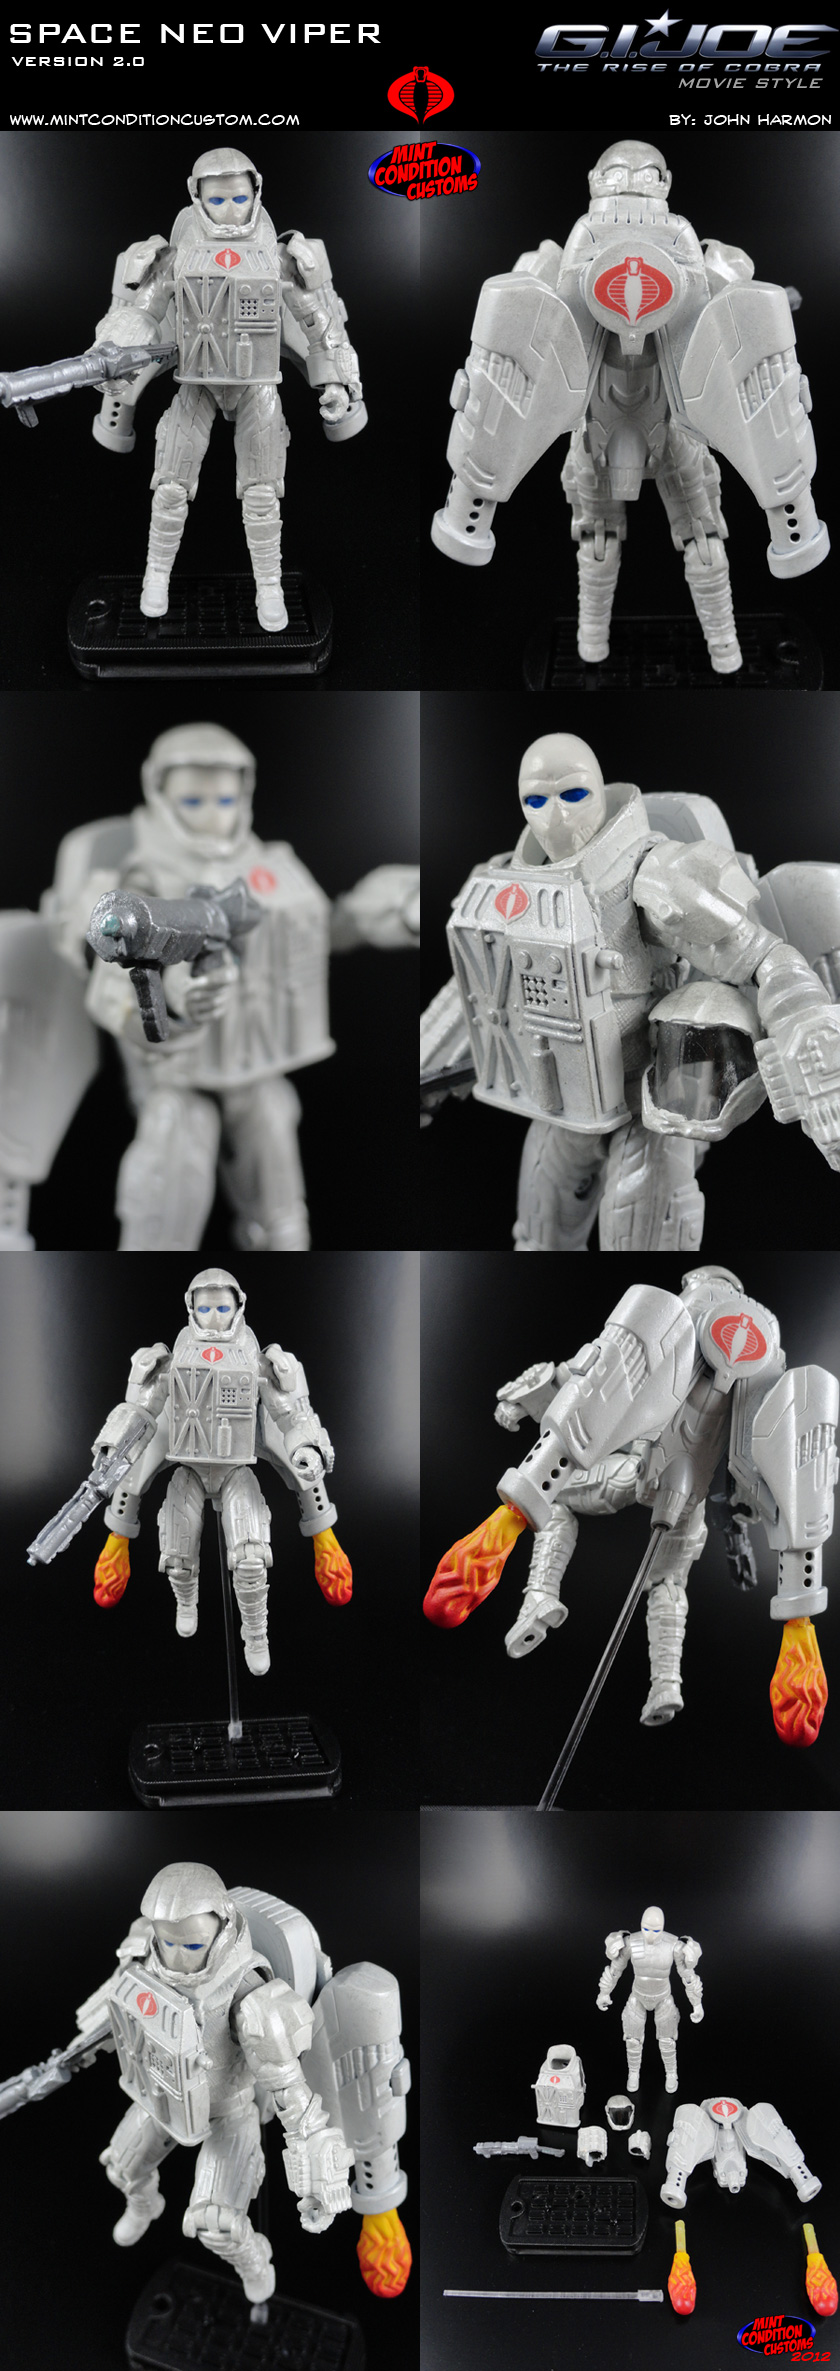 "Custom Space Neo Viper Version 2 3 3/4"" G.I. Joe Rise Pursuit of Cobra Retaliation Action Figure"